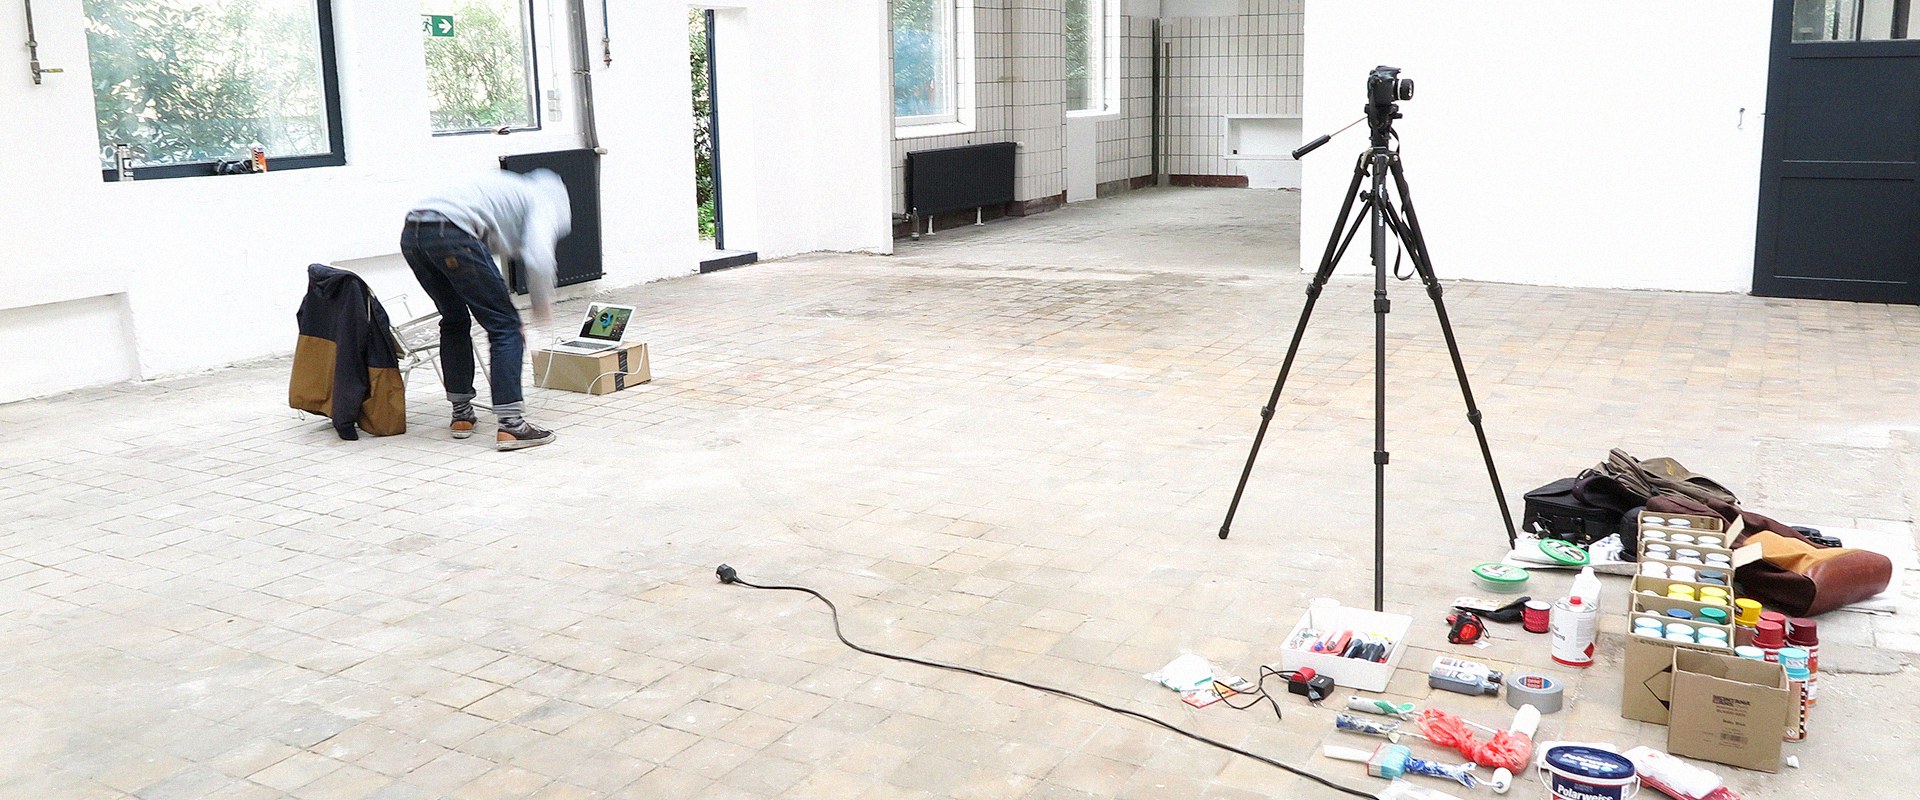 Bastian Hubald Vorbereitung Wandgestaltung